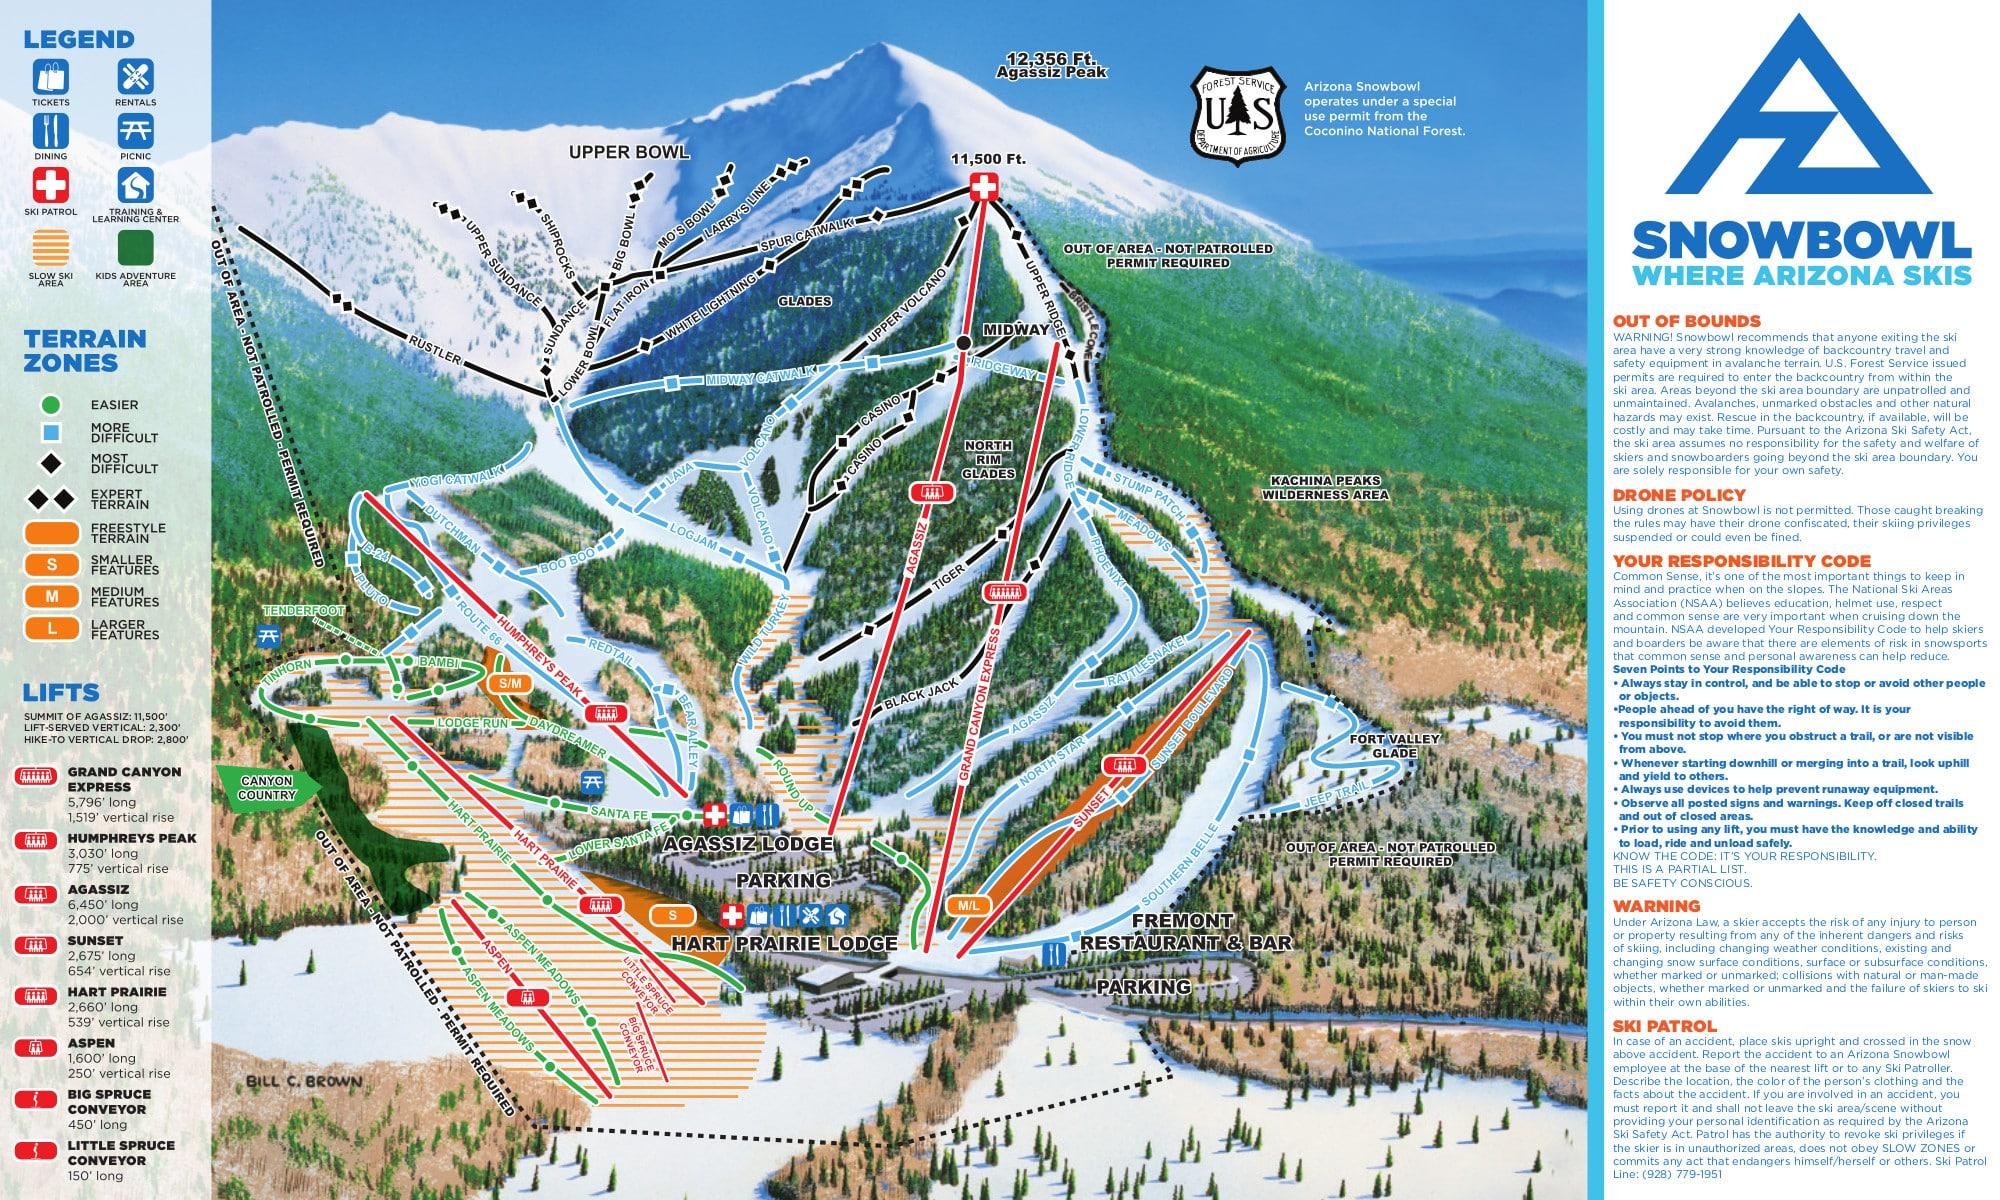 Arizona Snowbowl Piste / Trail Map